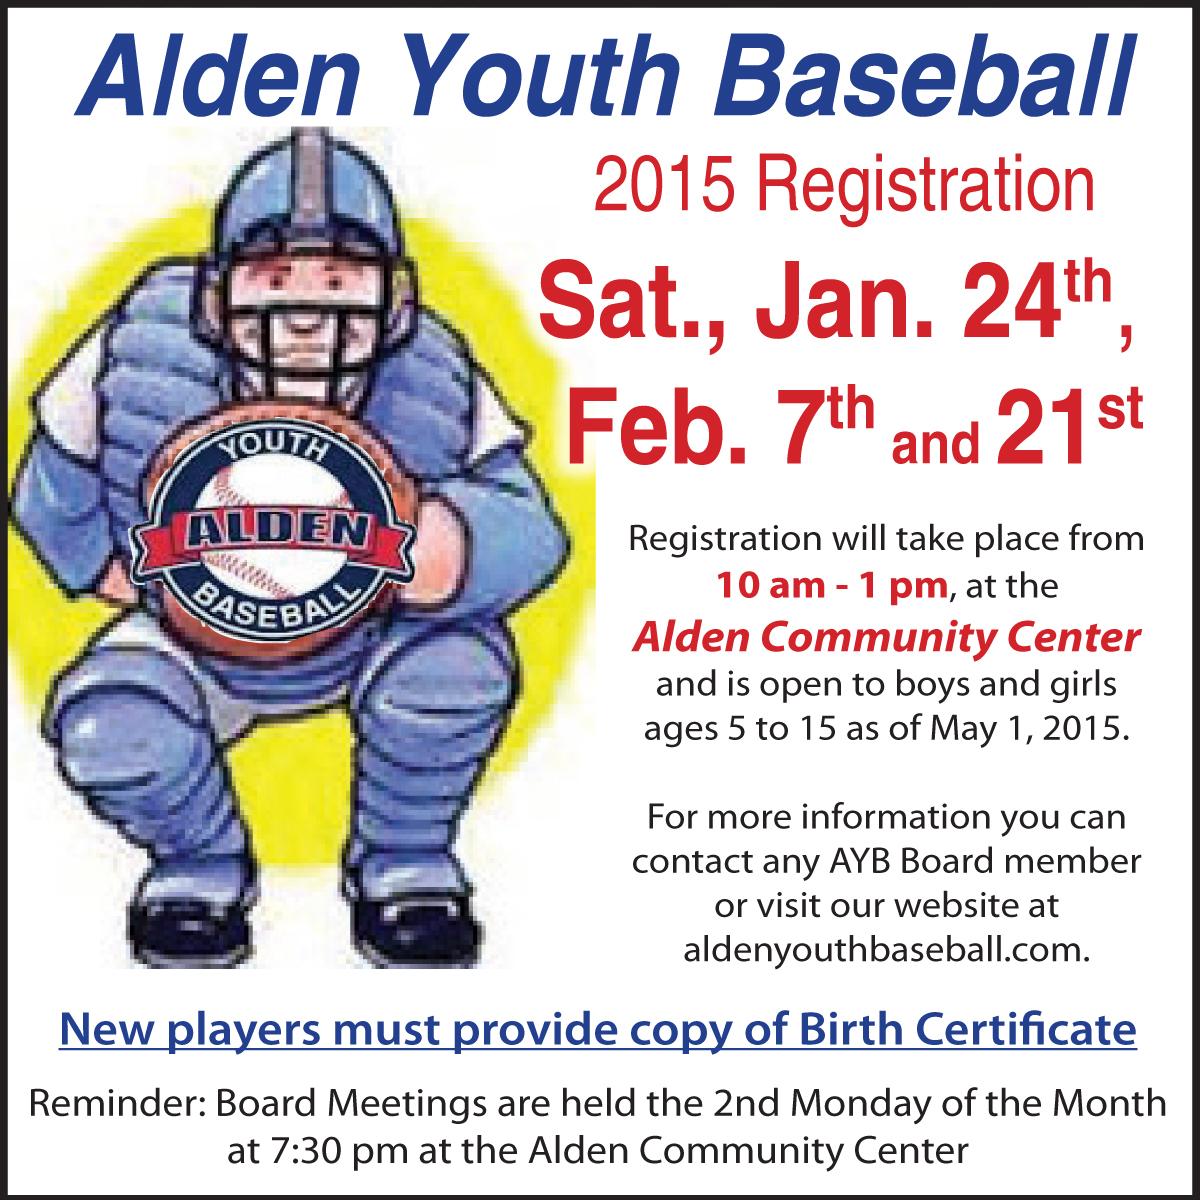 Alden Youth Baseball Registration